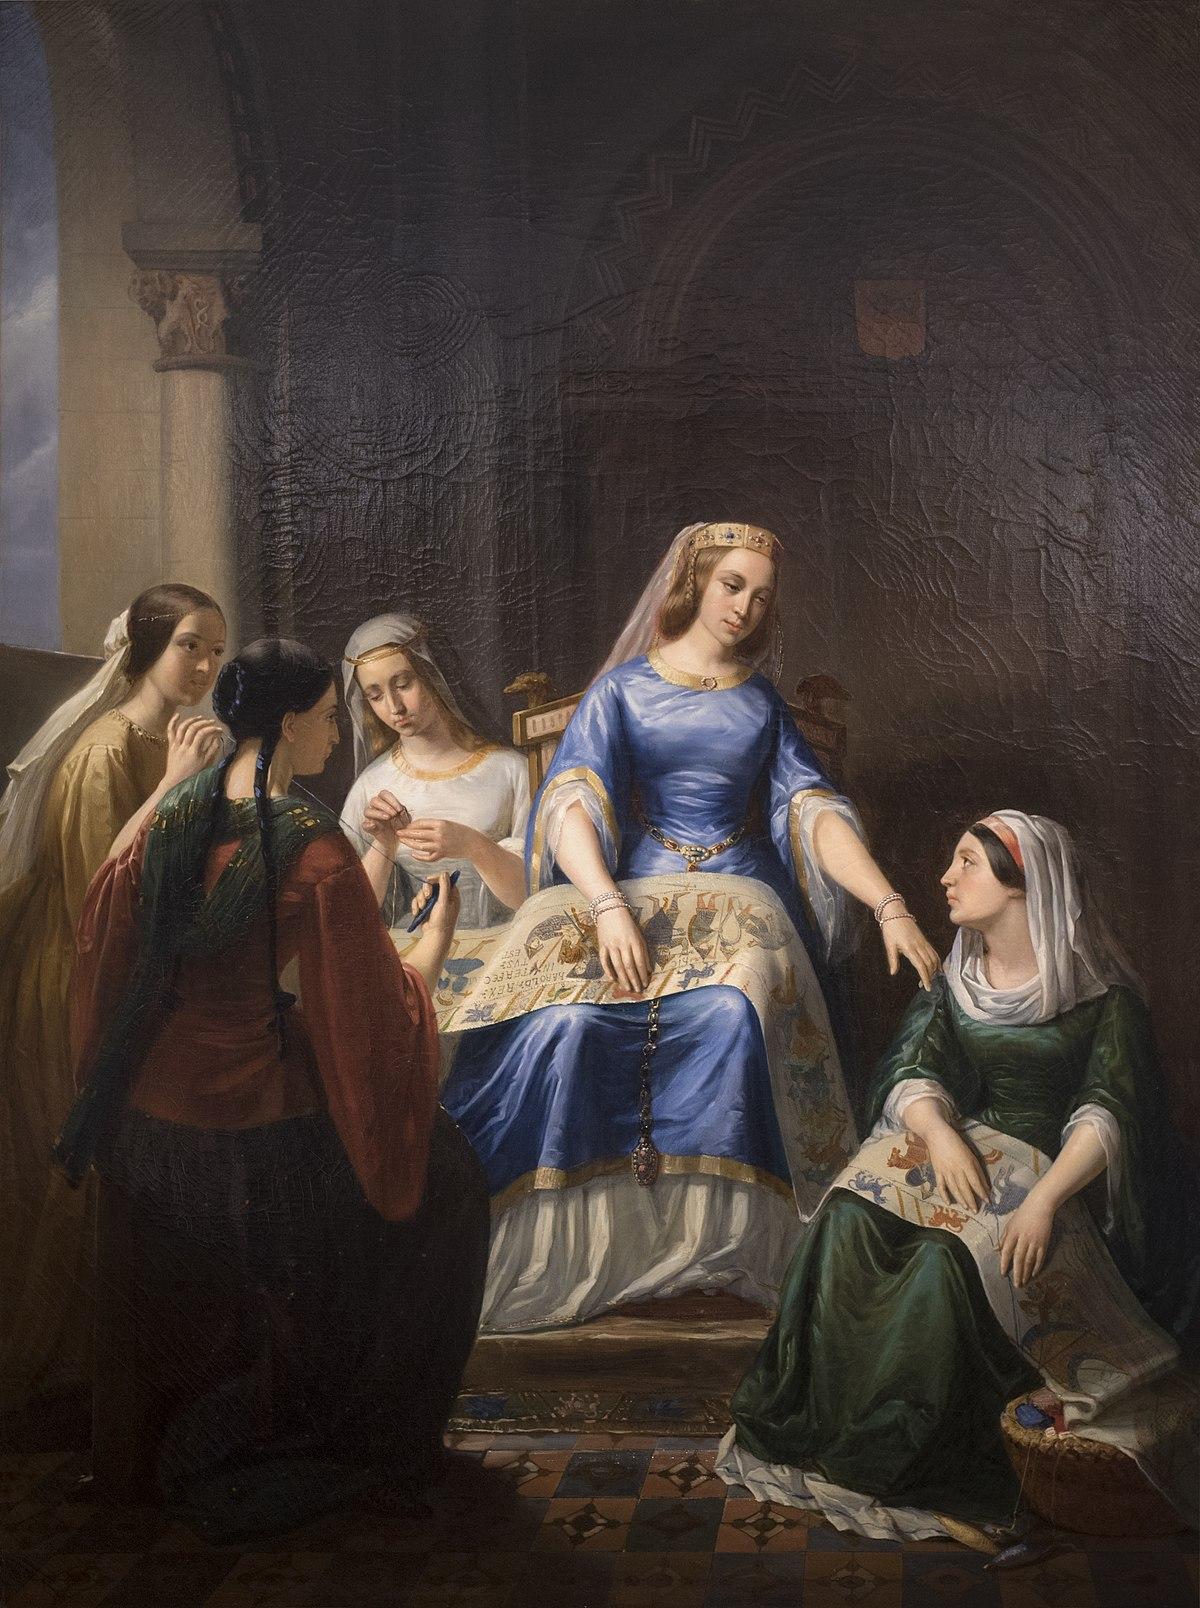 Matilda of Flanders - Wikimedia Commons